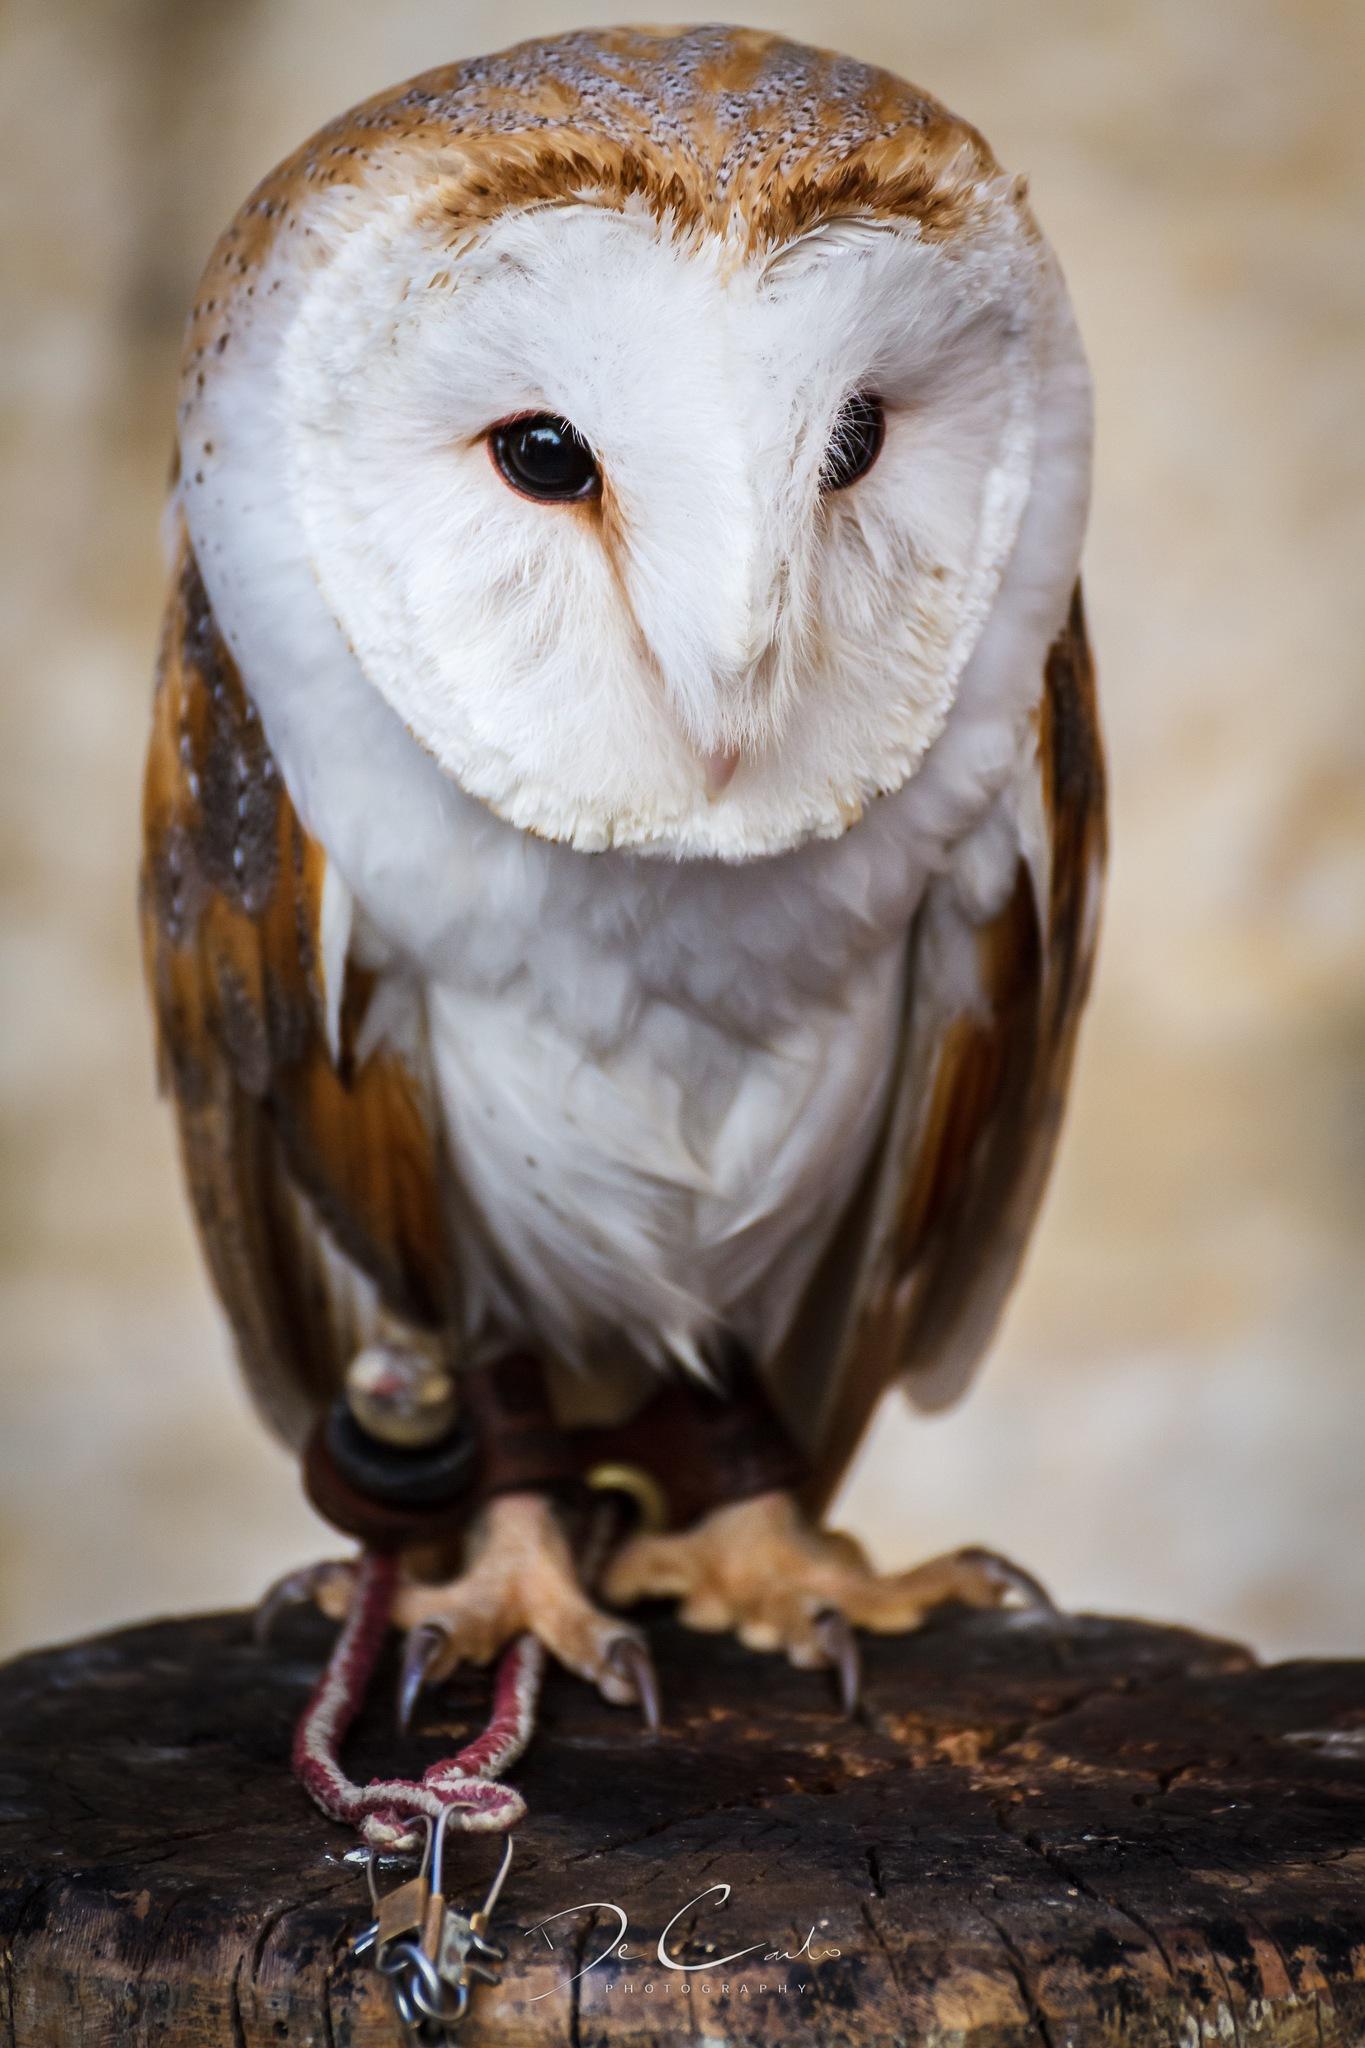 Owl's mask by Robert De Carlo